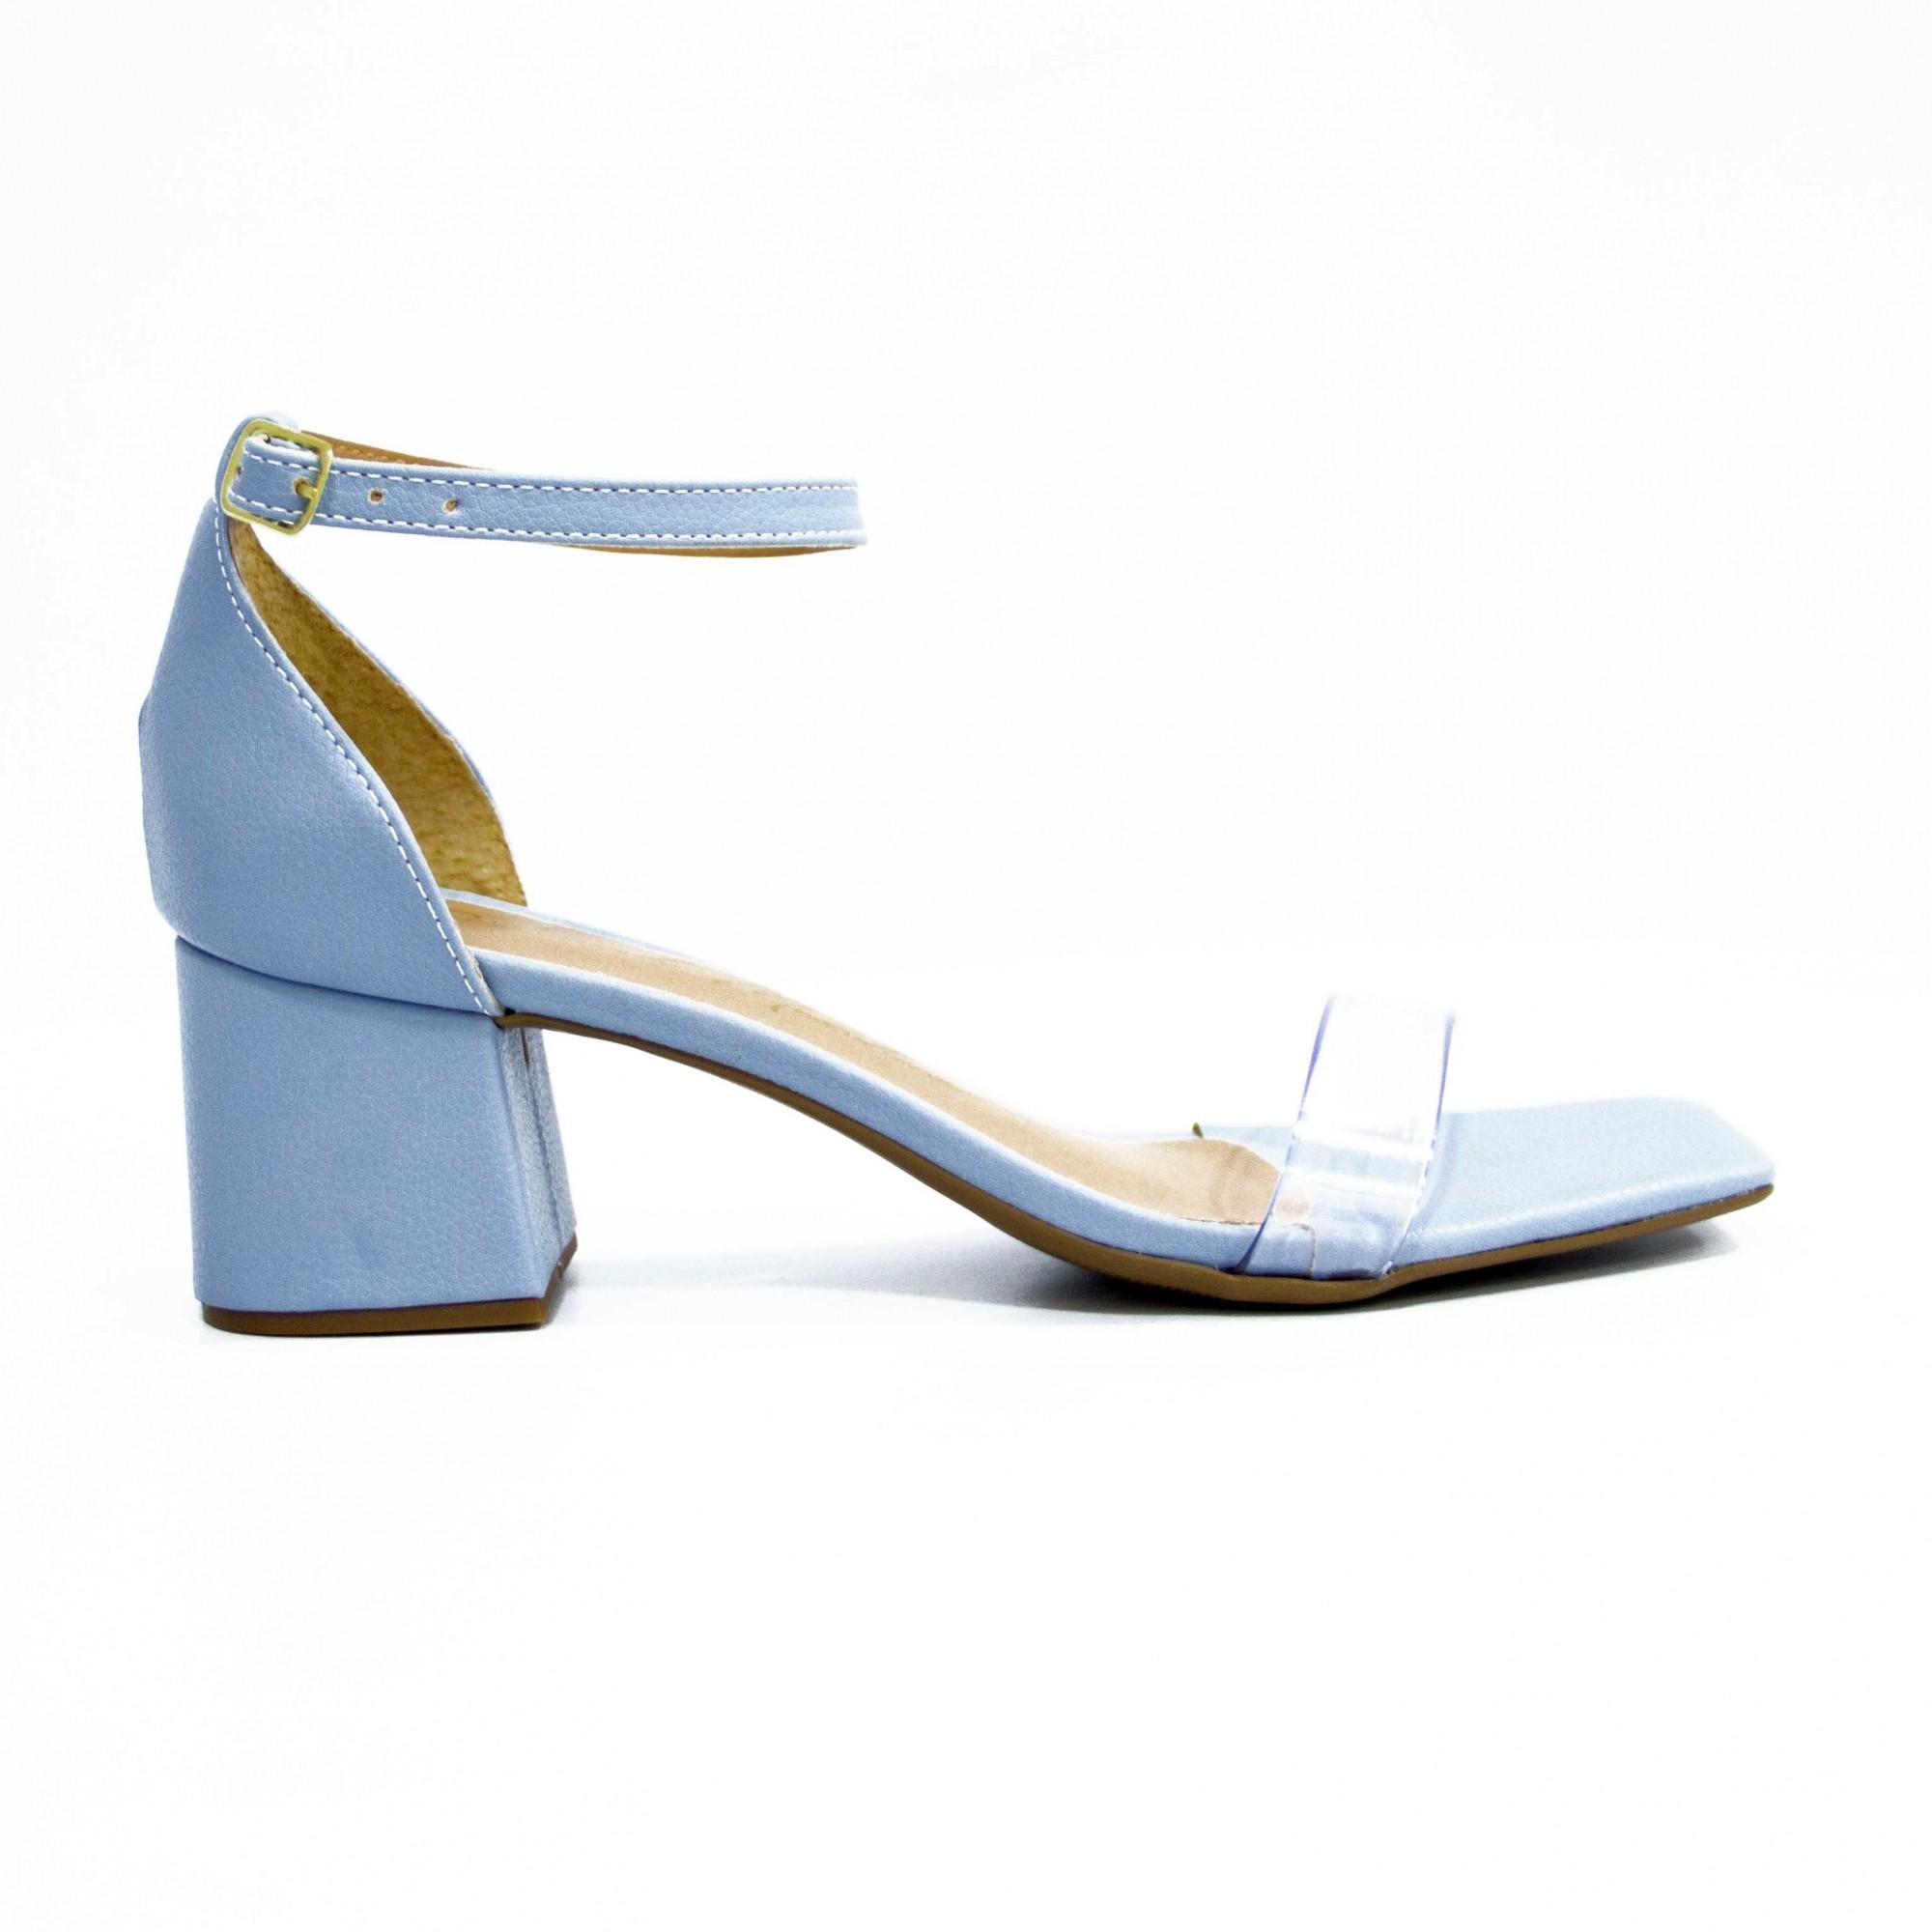 Sandália Maju Azul Bebe by Deborah Munhoz